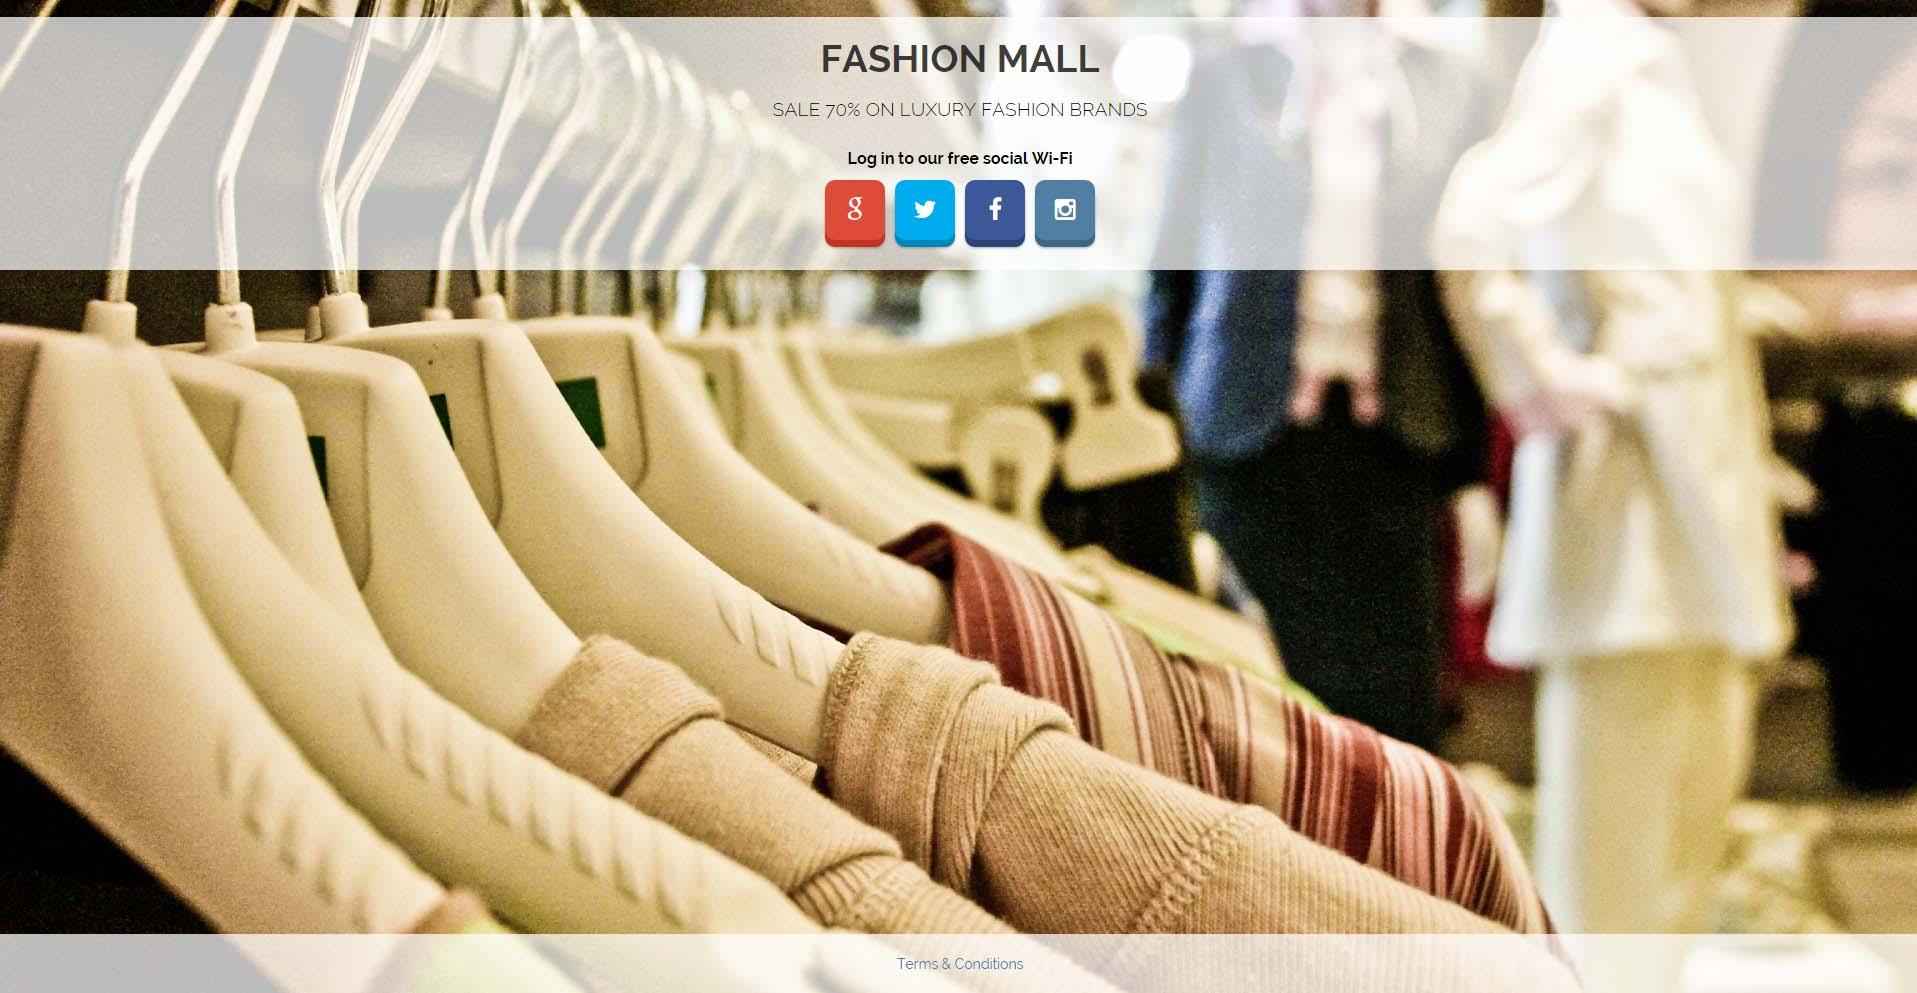 Free Social WiFi for Fashion Mall